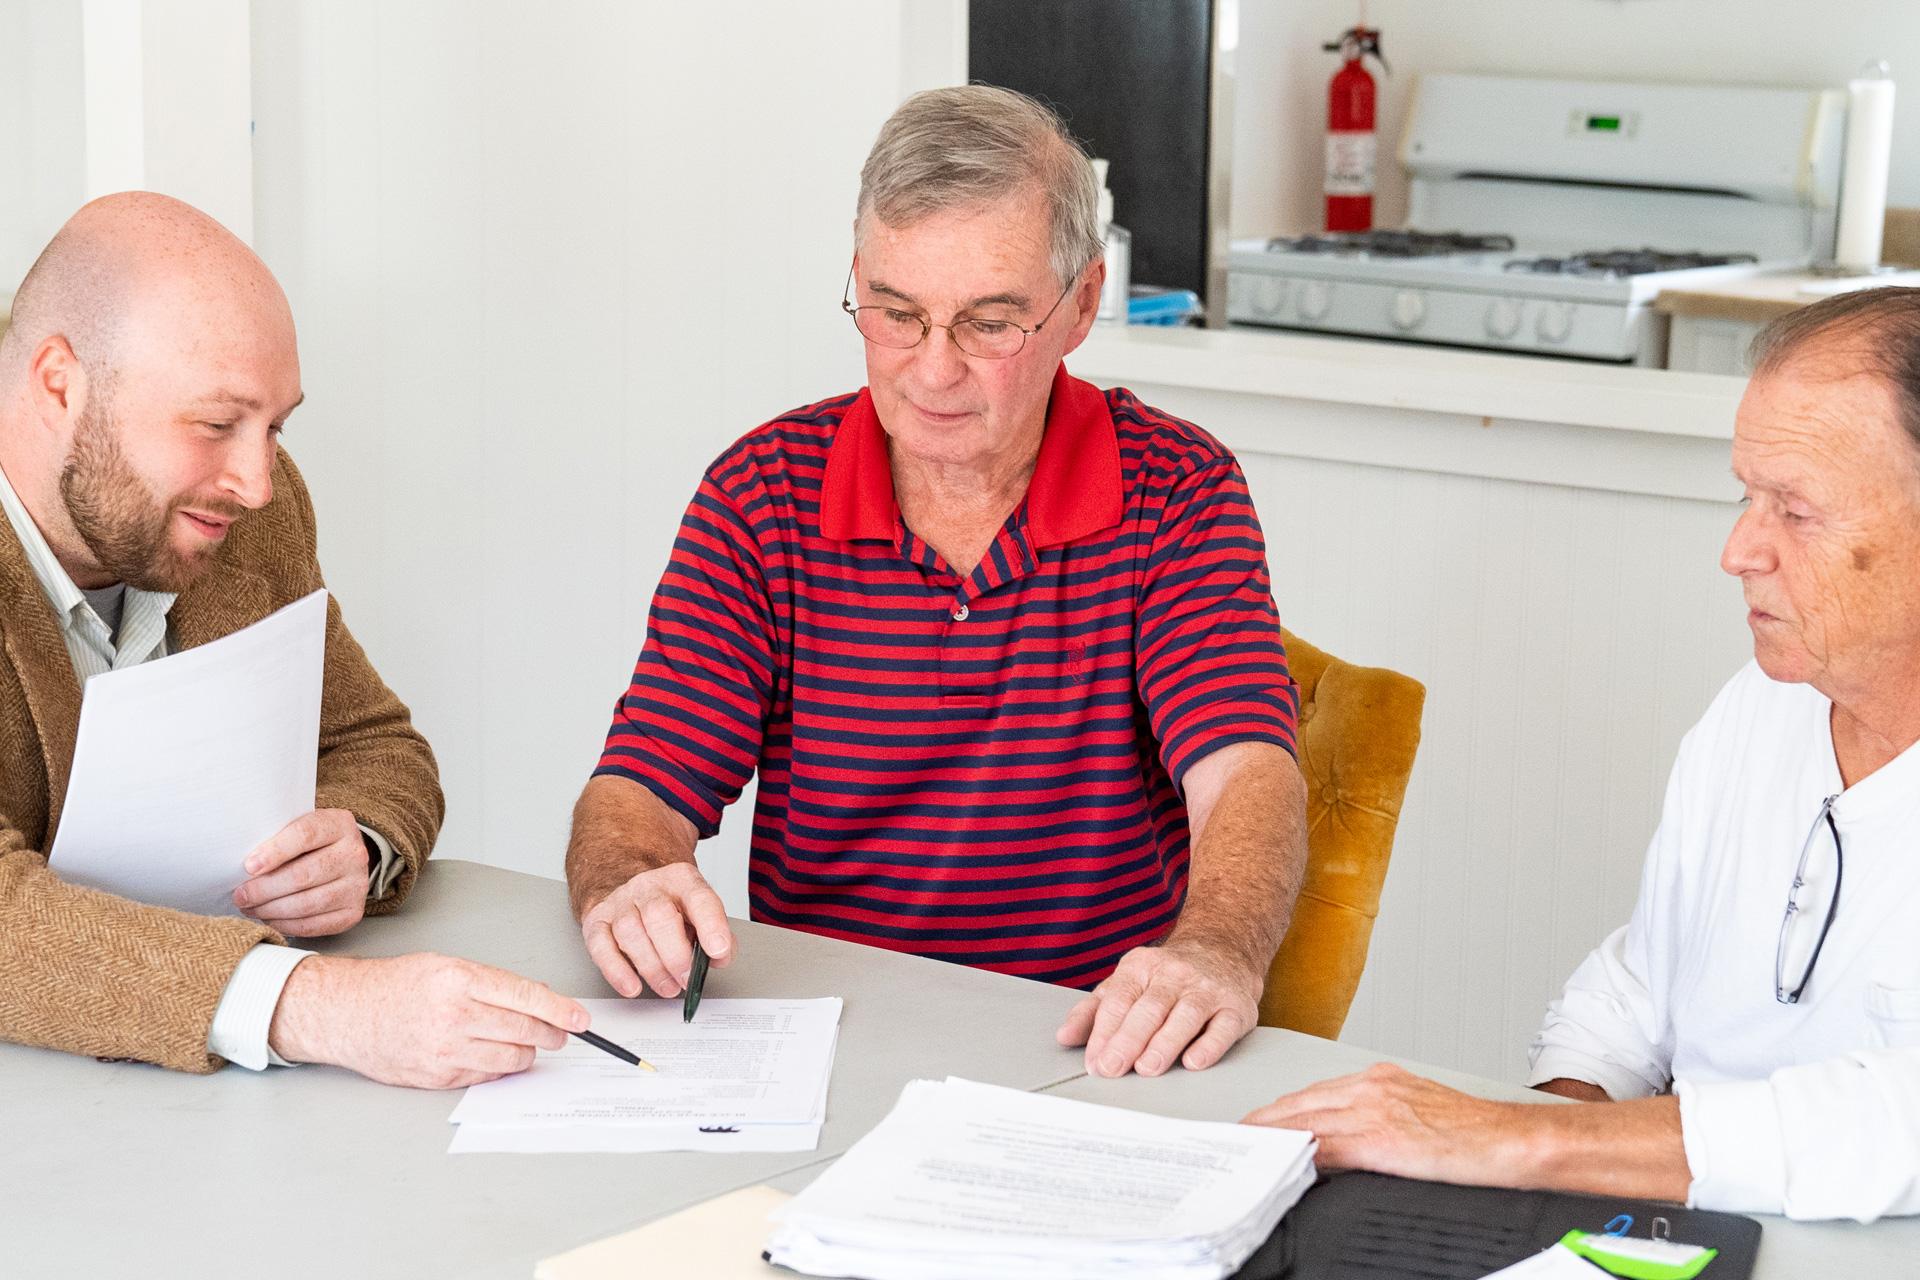 Three men meet around table